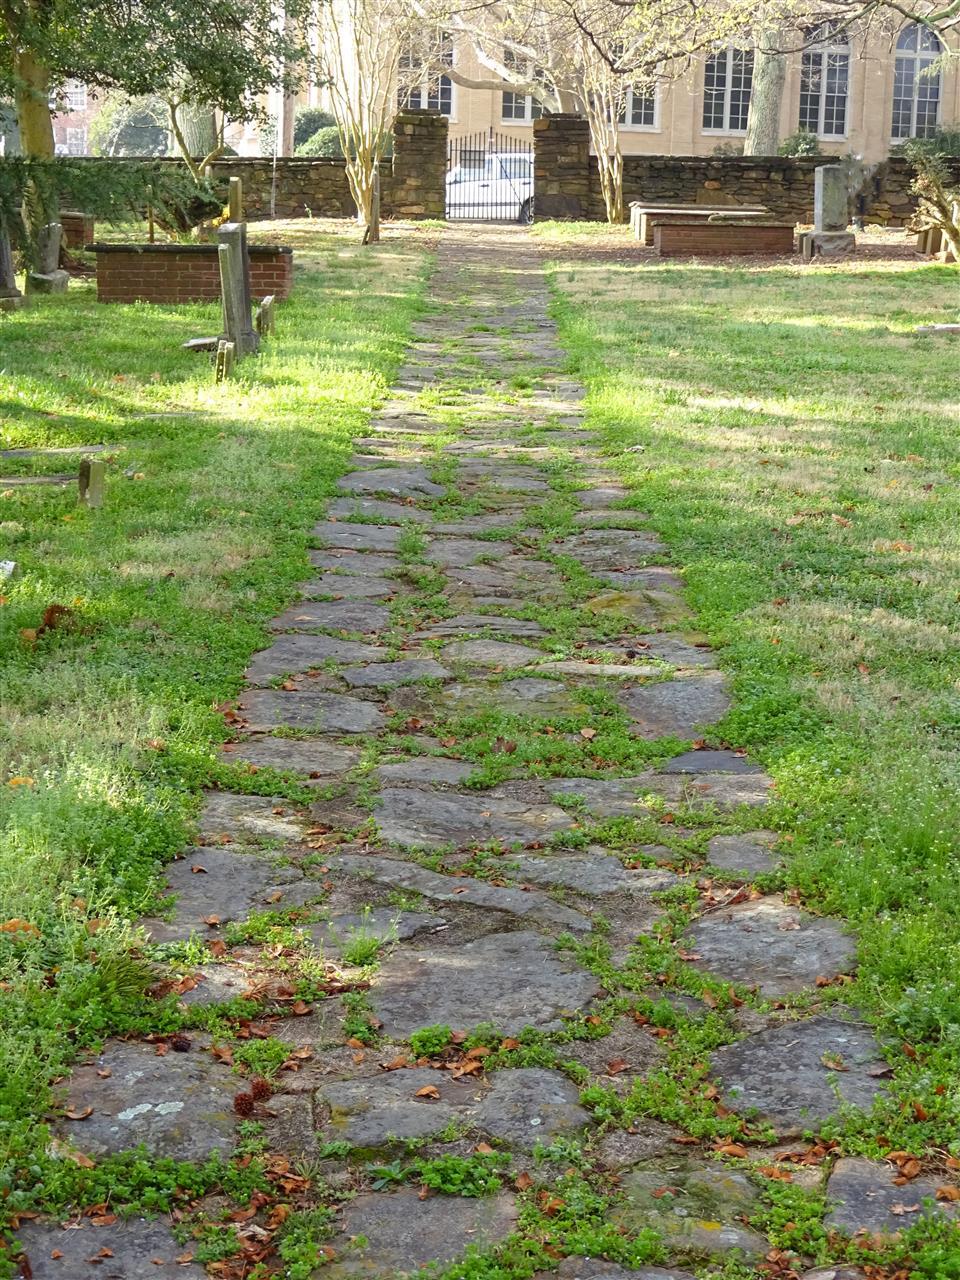 Fourth Creek Cemetery establish in 1758 in Statesville, NC #Statesville #NC #FourthCreekCemetery